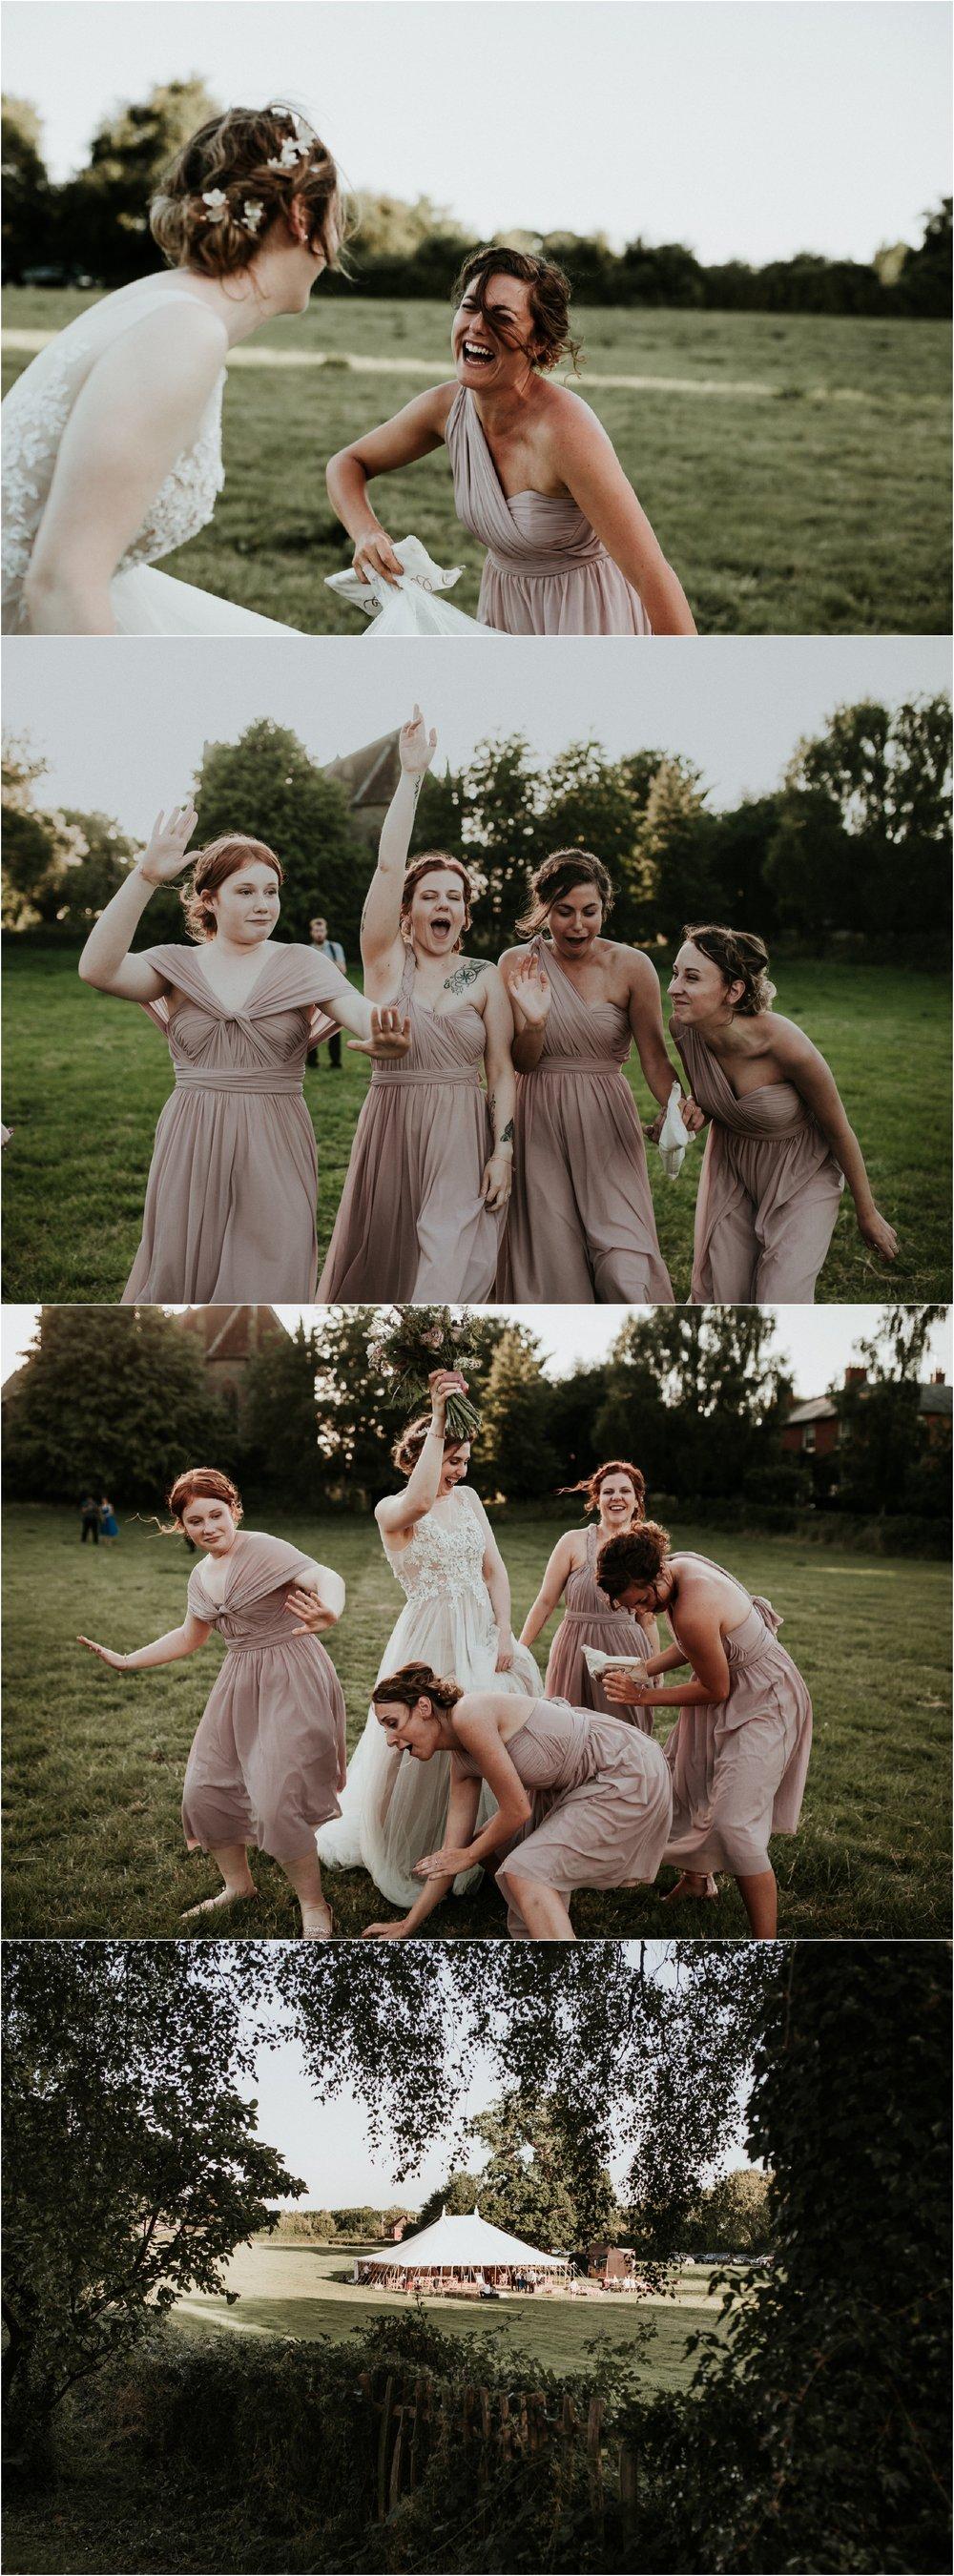 Herefordshire-uk-wedding-photographer_0077.jpg